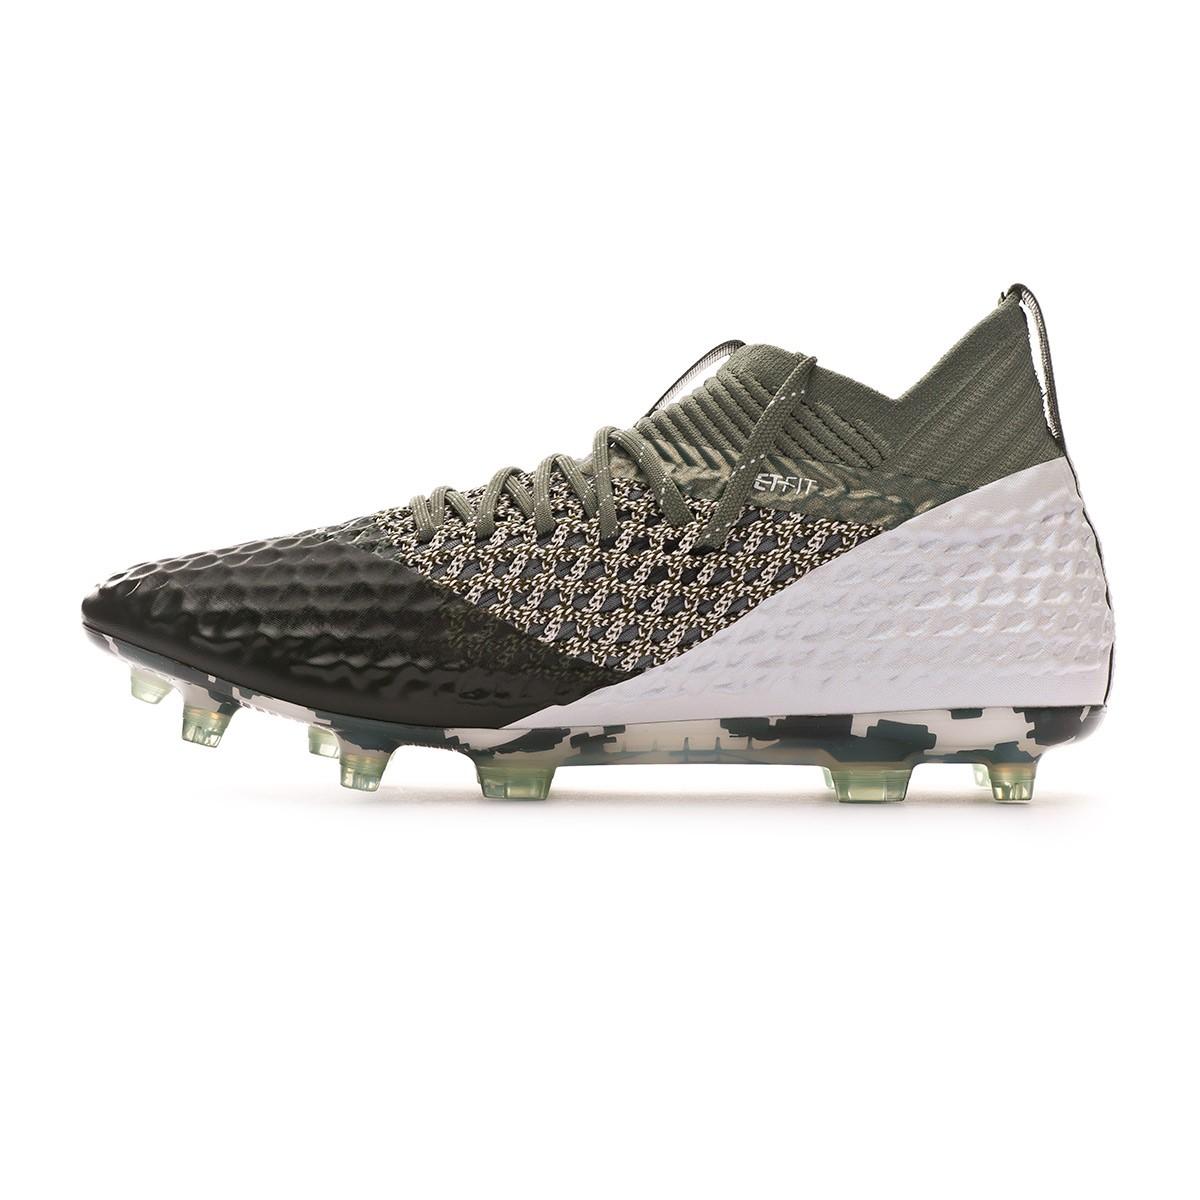 616324d15 Football Boots Puma Future 2.1 Netfit FG/AG Camo - Tienda de fútbol Fútbol  Emotion